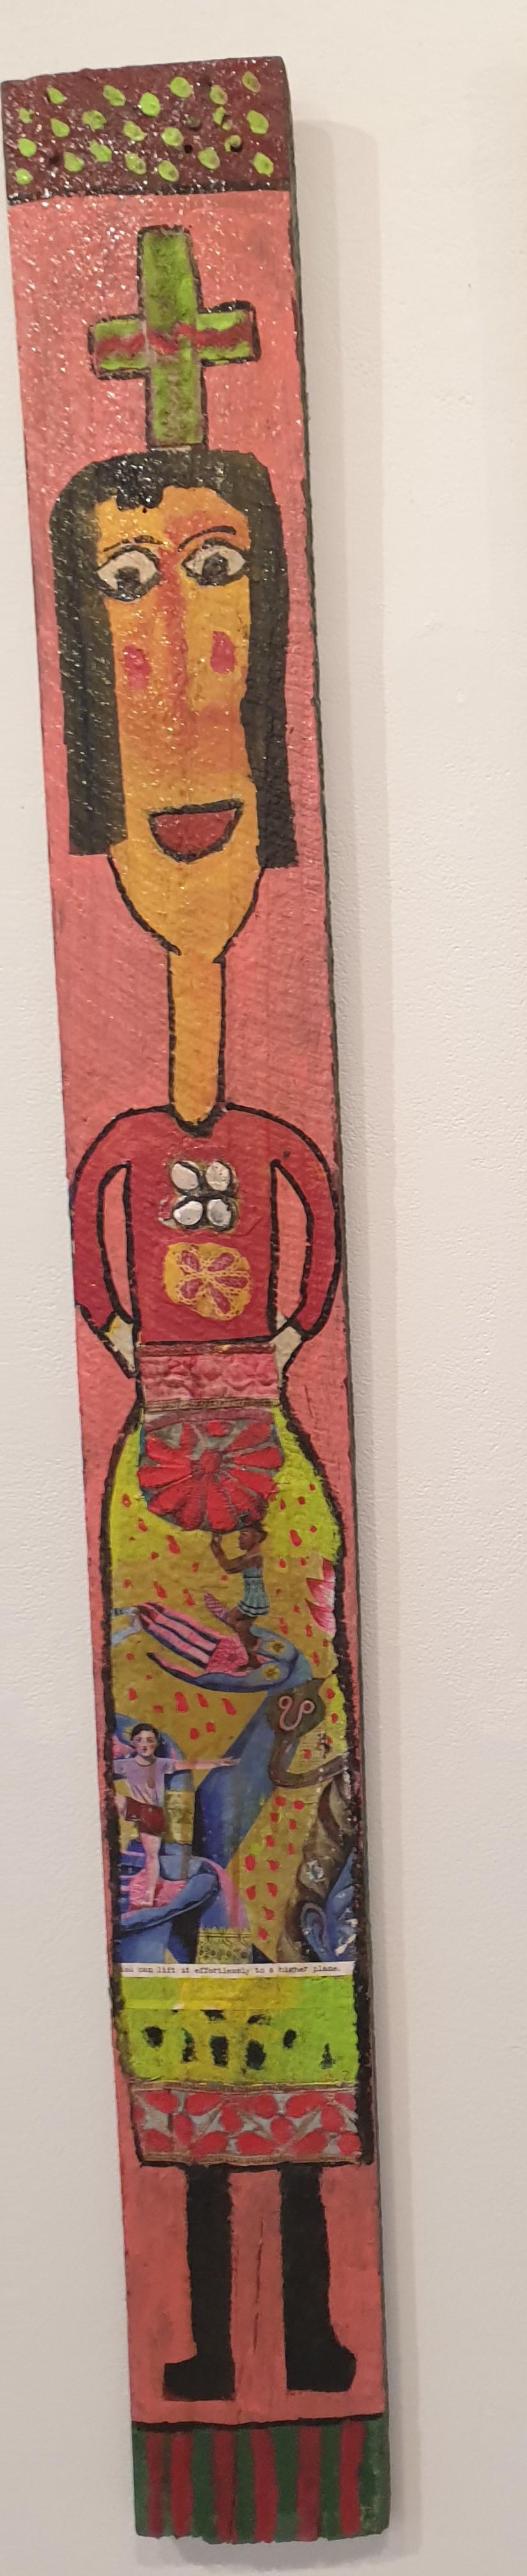 Frida Panel 9